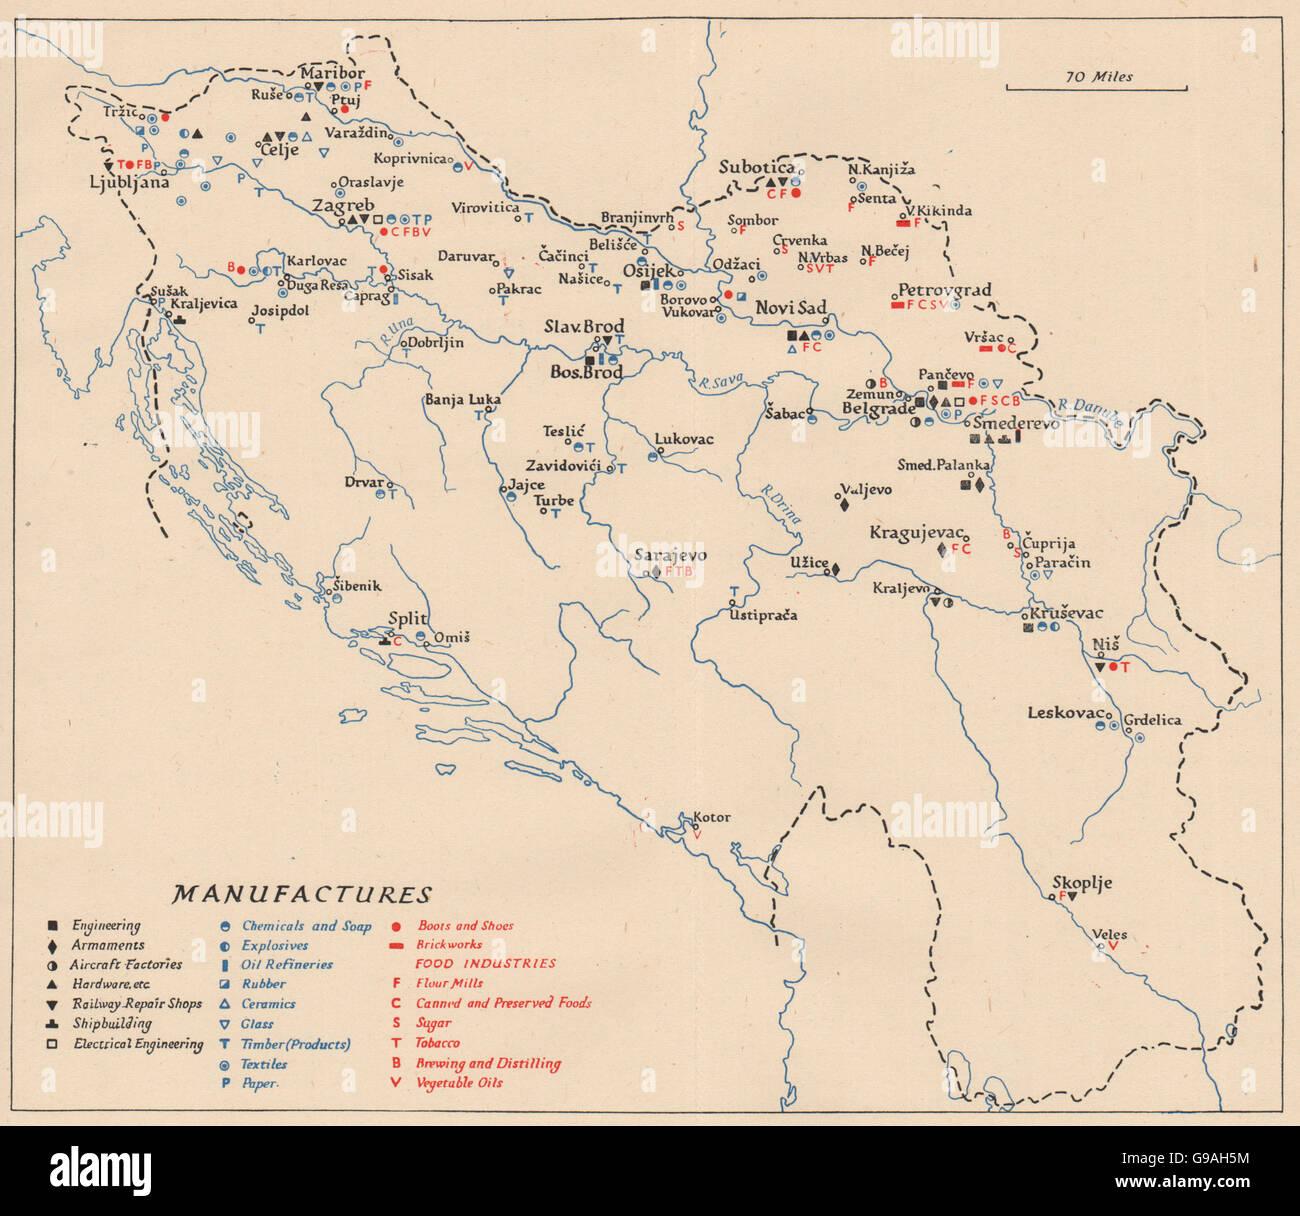 YUGOSLAVIA: Manufacturing industries. WW2 ROYAL NAVY INTELLIGENCE MAP, 1945 - Stock Image